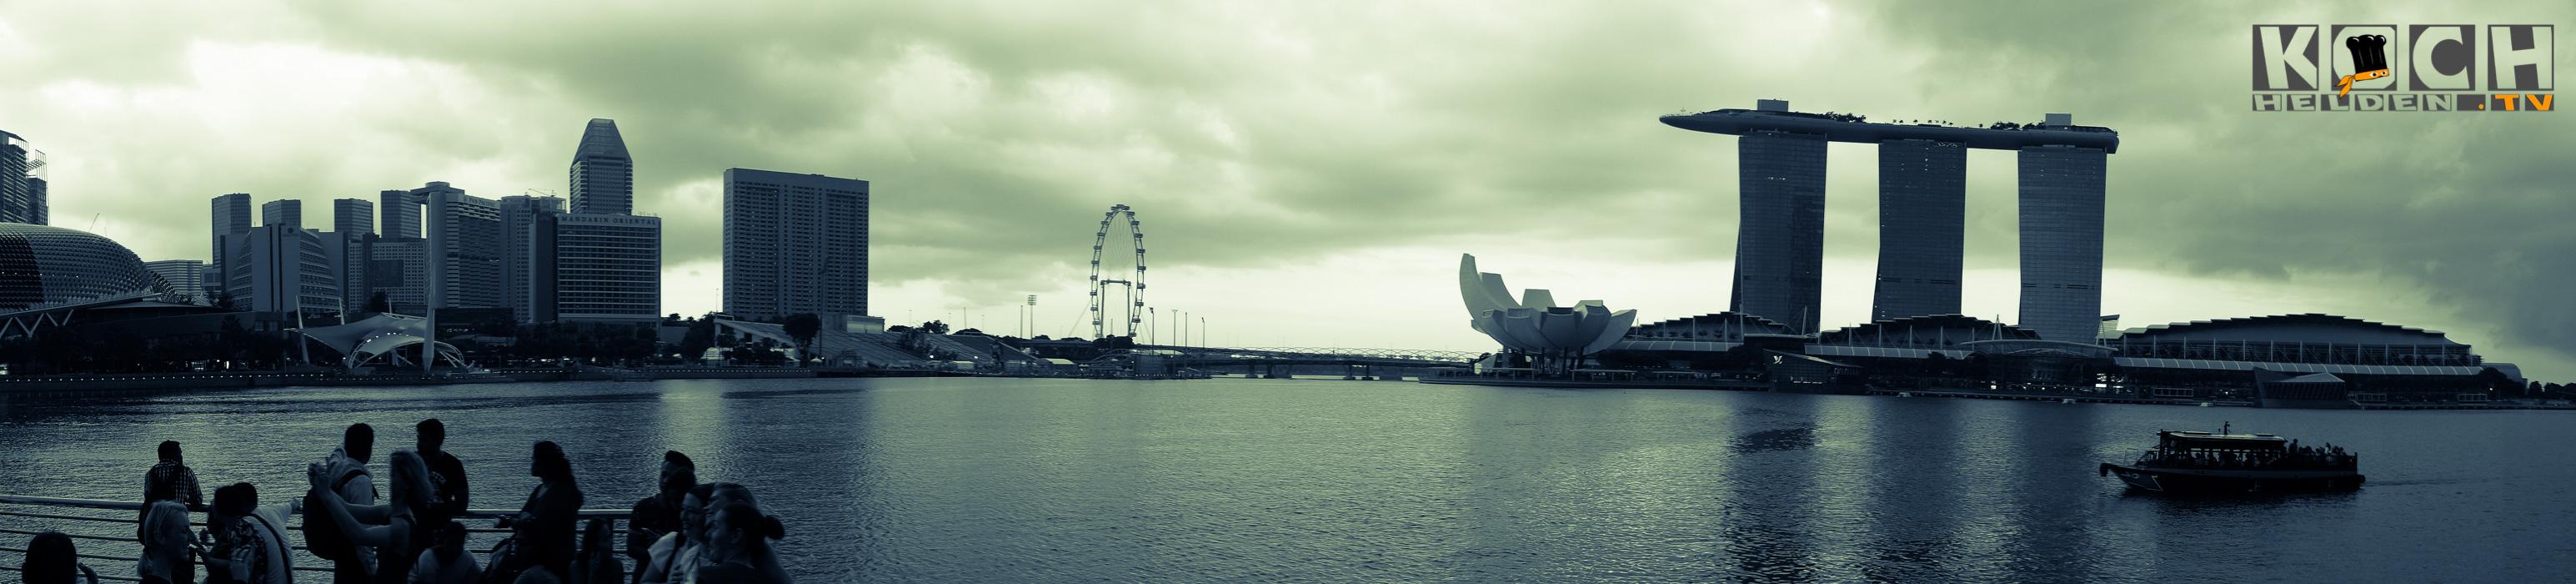 Skyline Singapore - www.kochhelden.tv